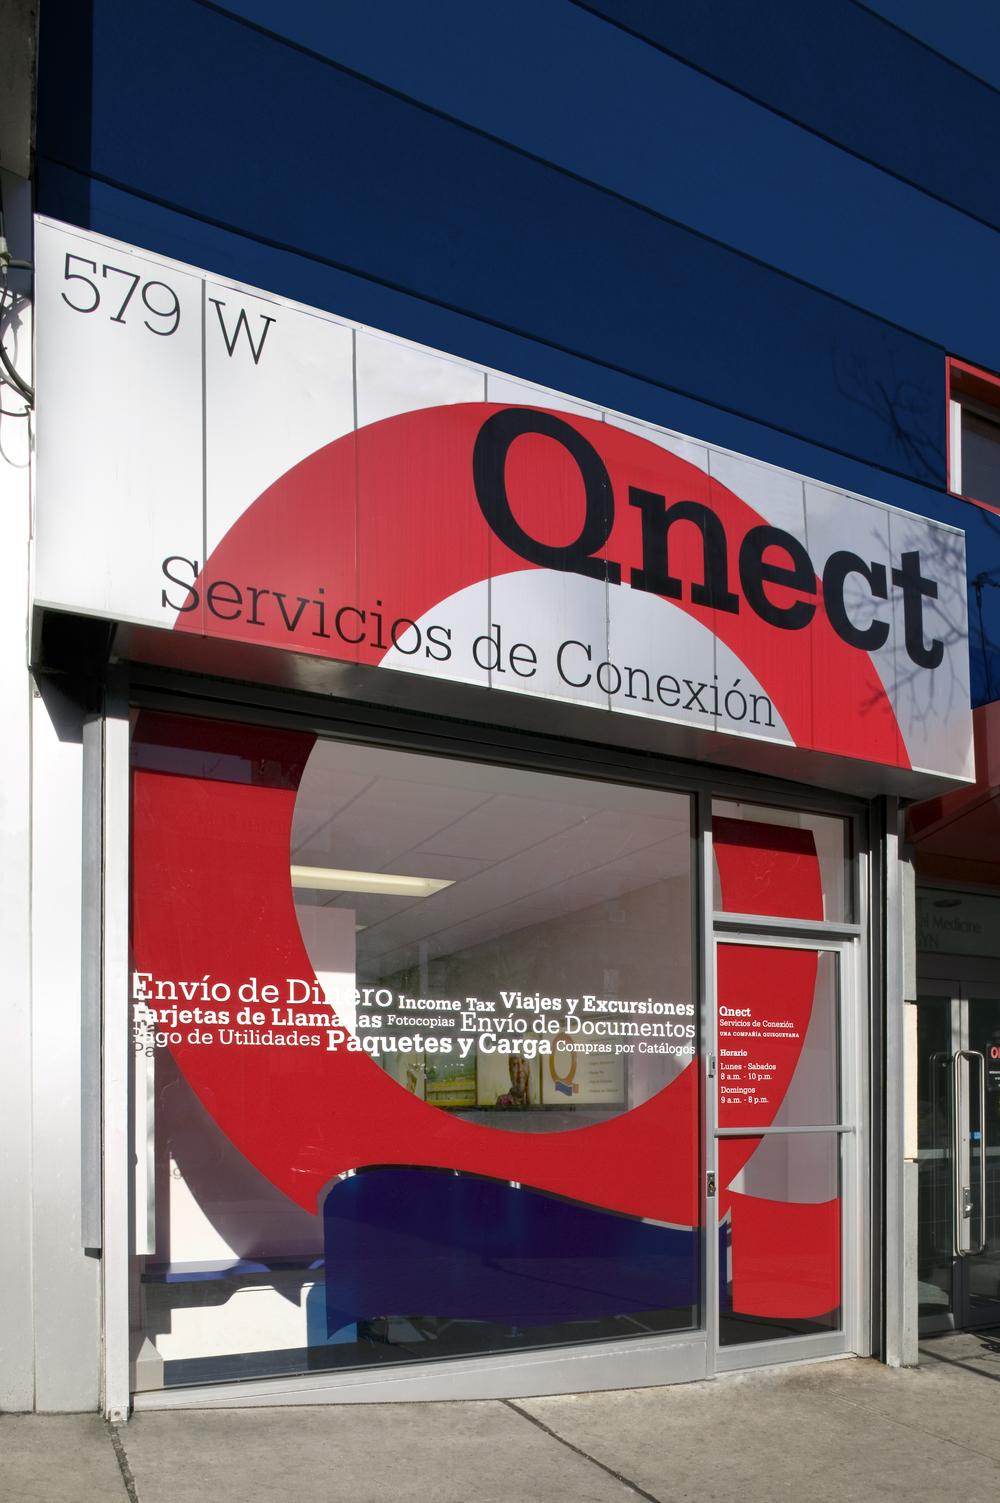 Qnet_05.jpg